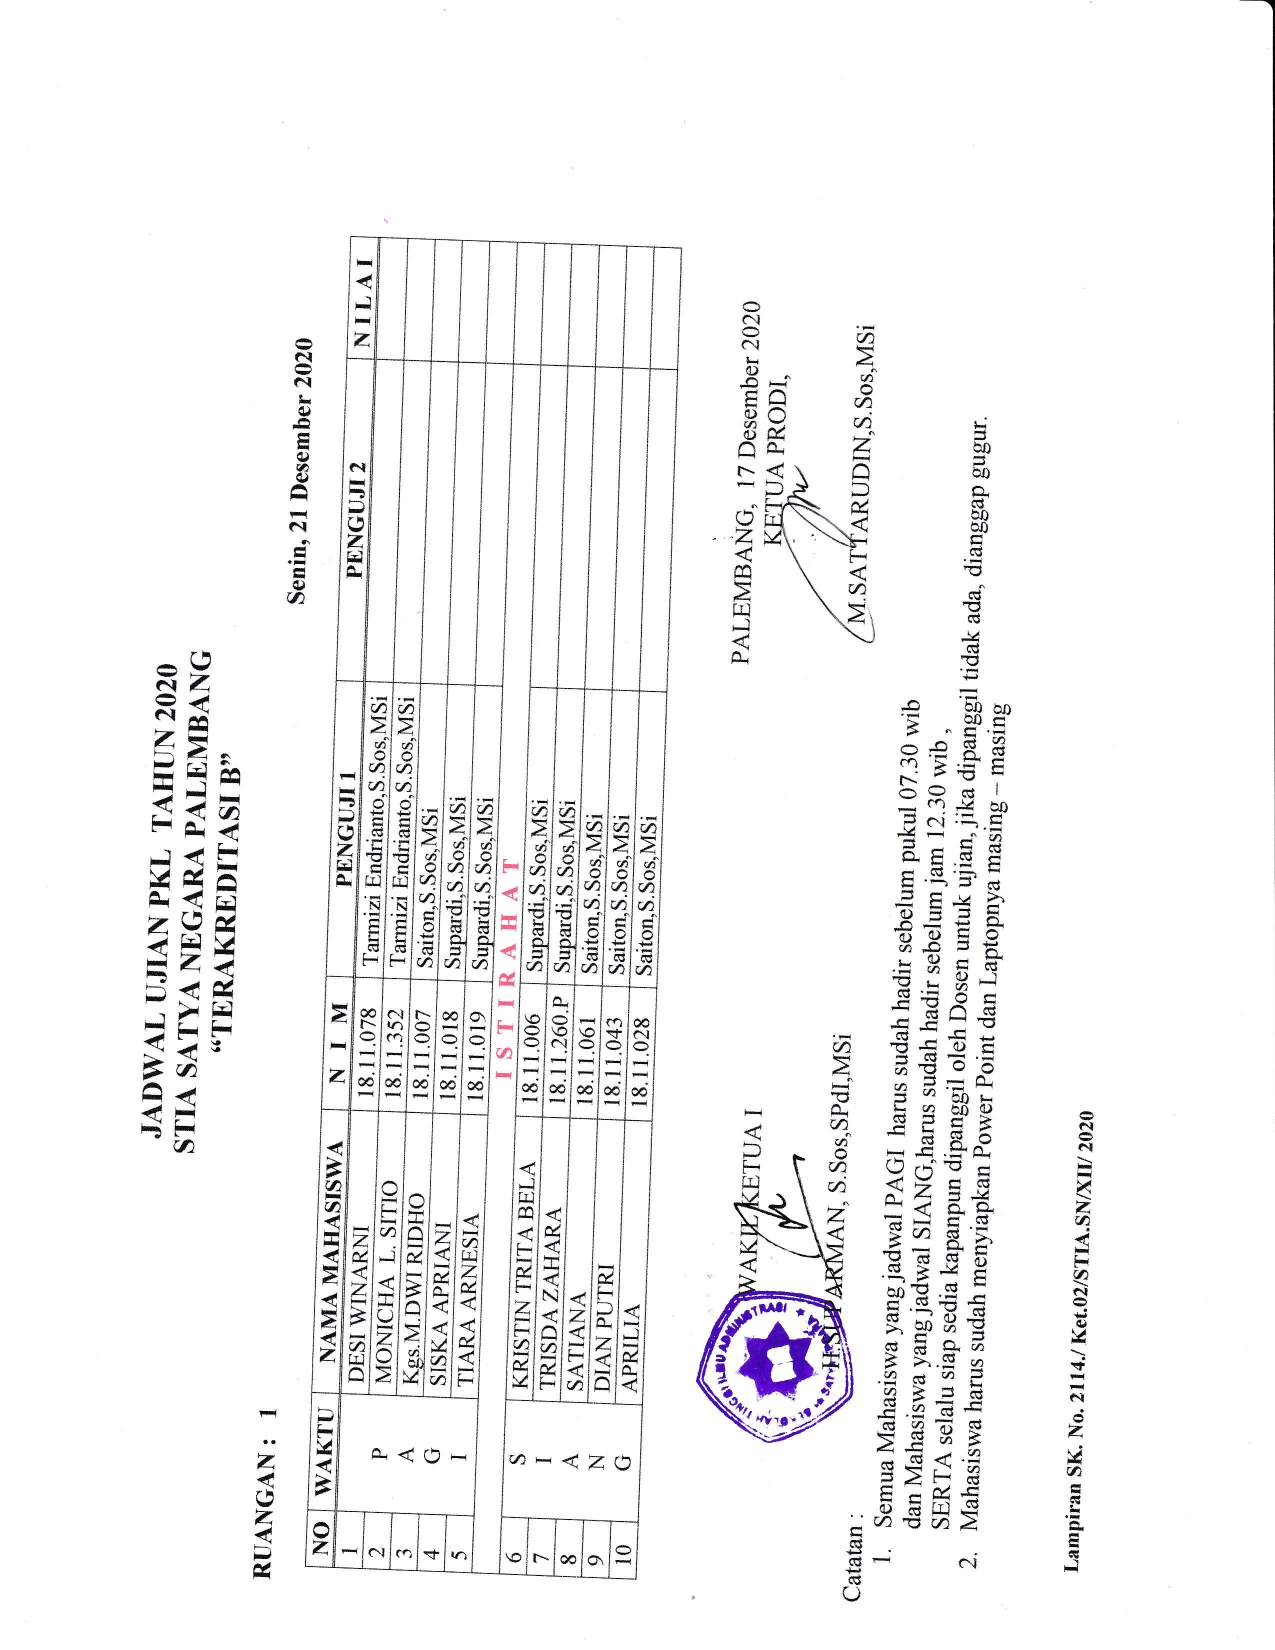 Ujian PKL tanggal 211